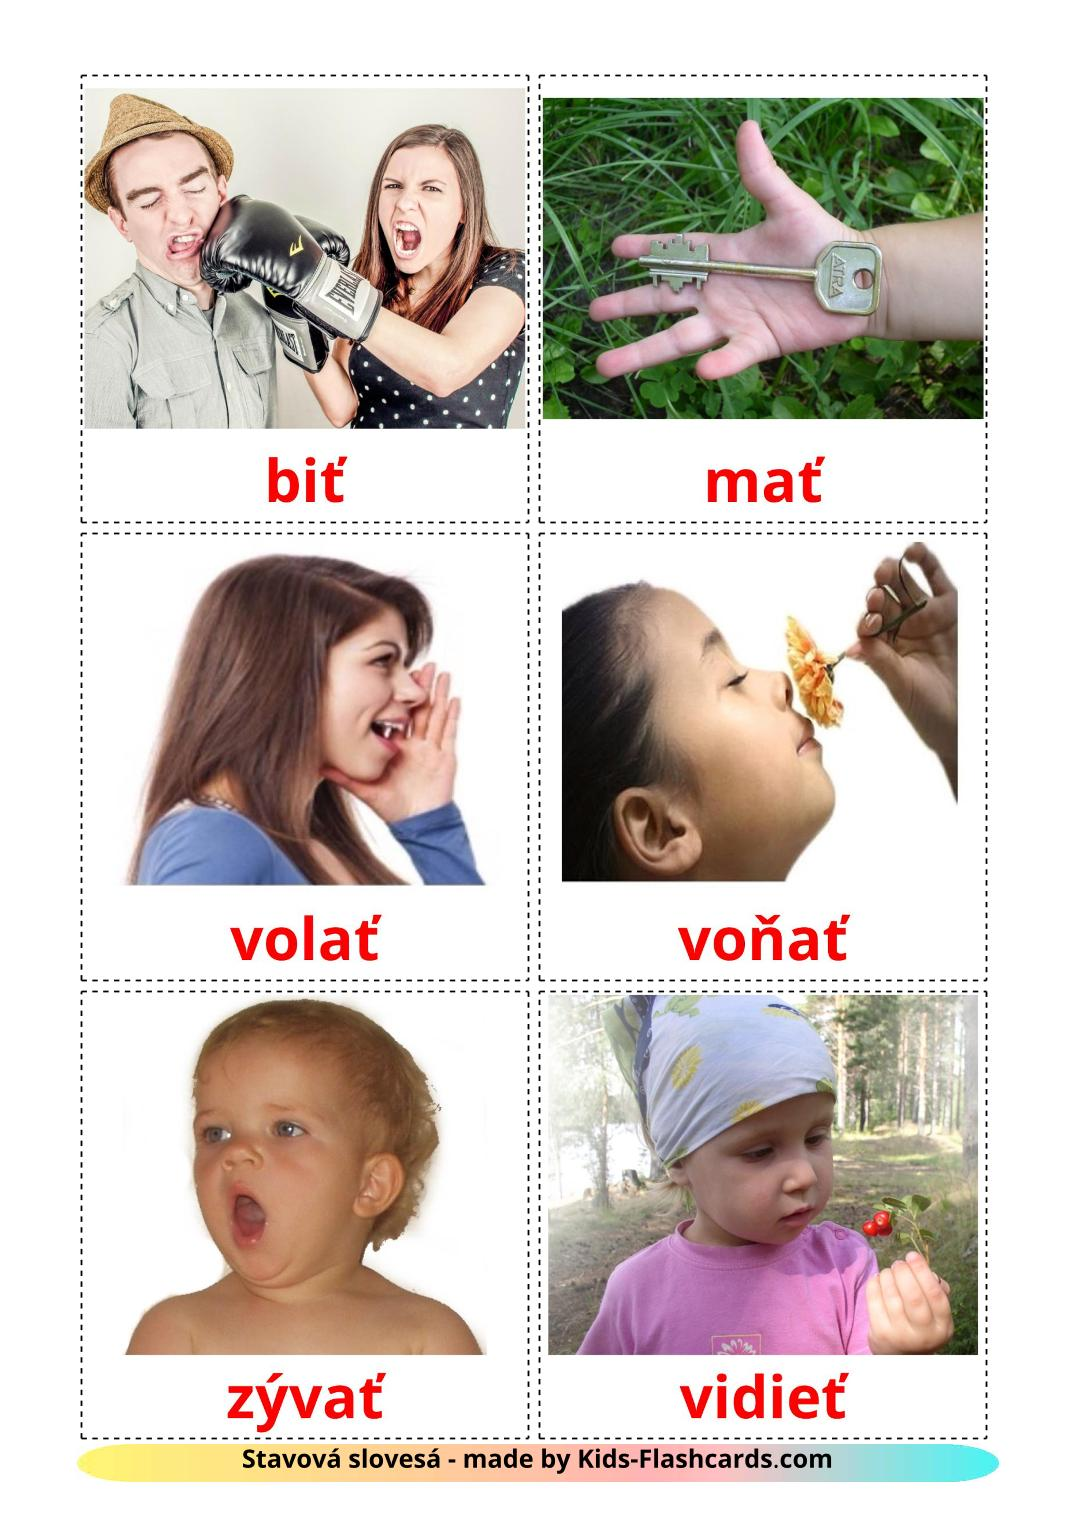 State verbs - 23 Free Printable slovak Flashcards